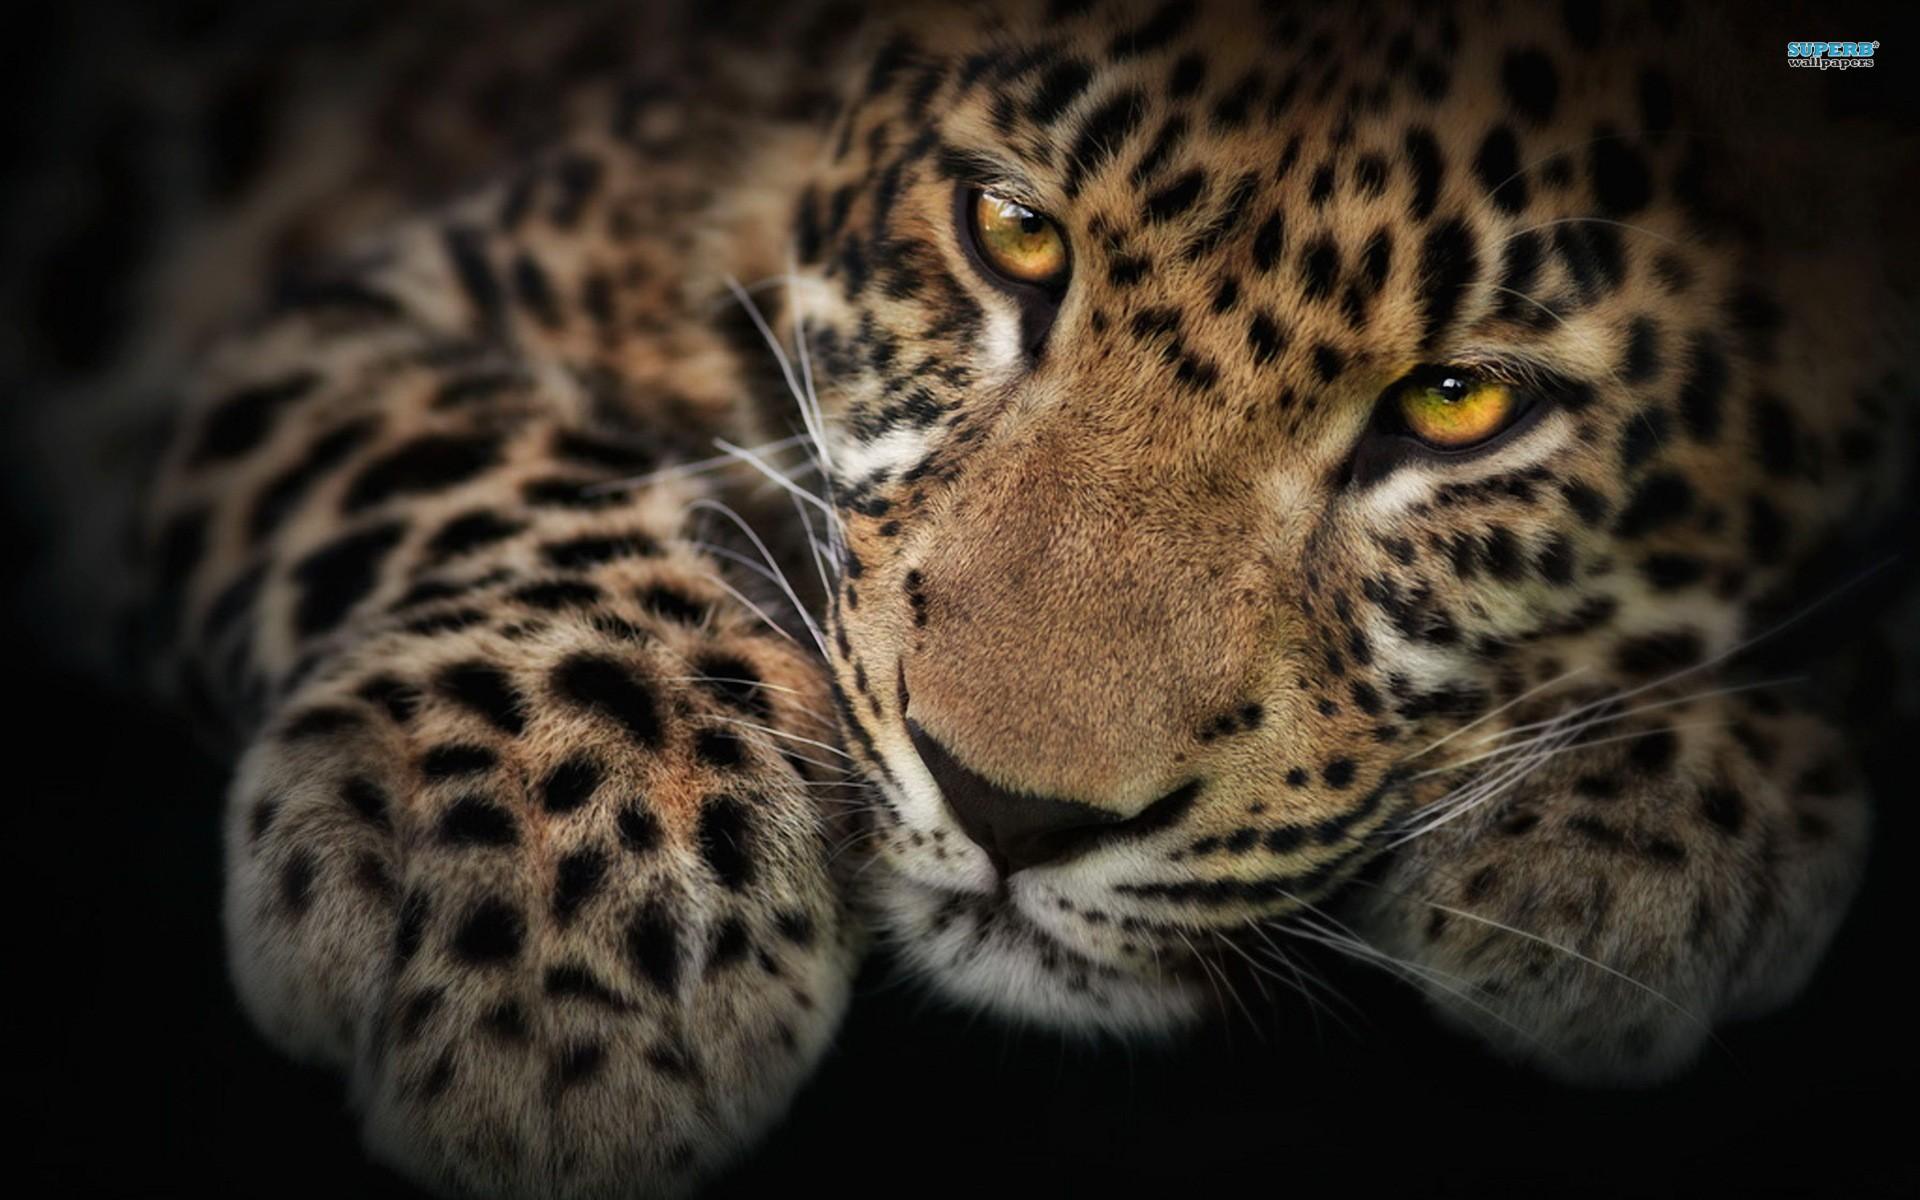 Leopard Wallpaper Full HD ImageBankbiz 1920x1200